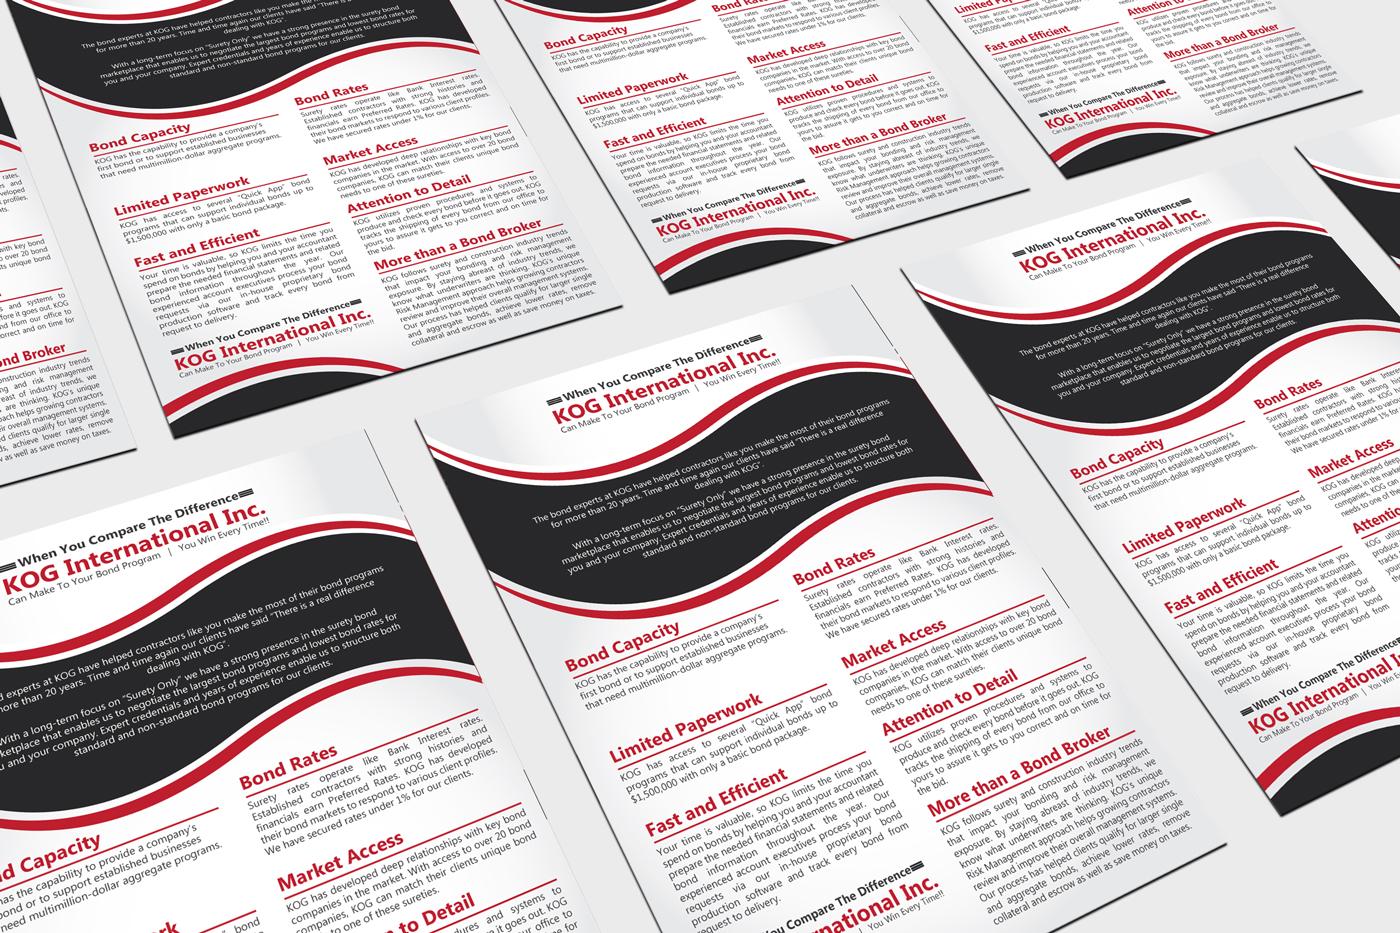 Elegant, Playful Flyer Design for a Company by Prism